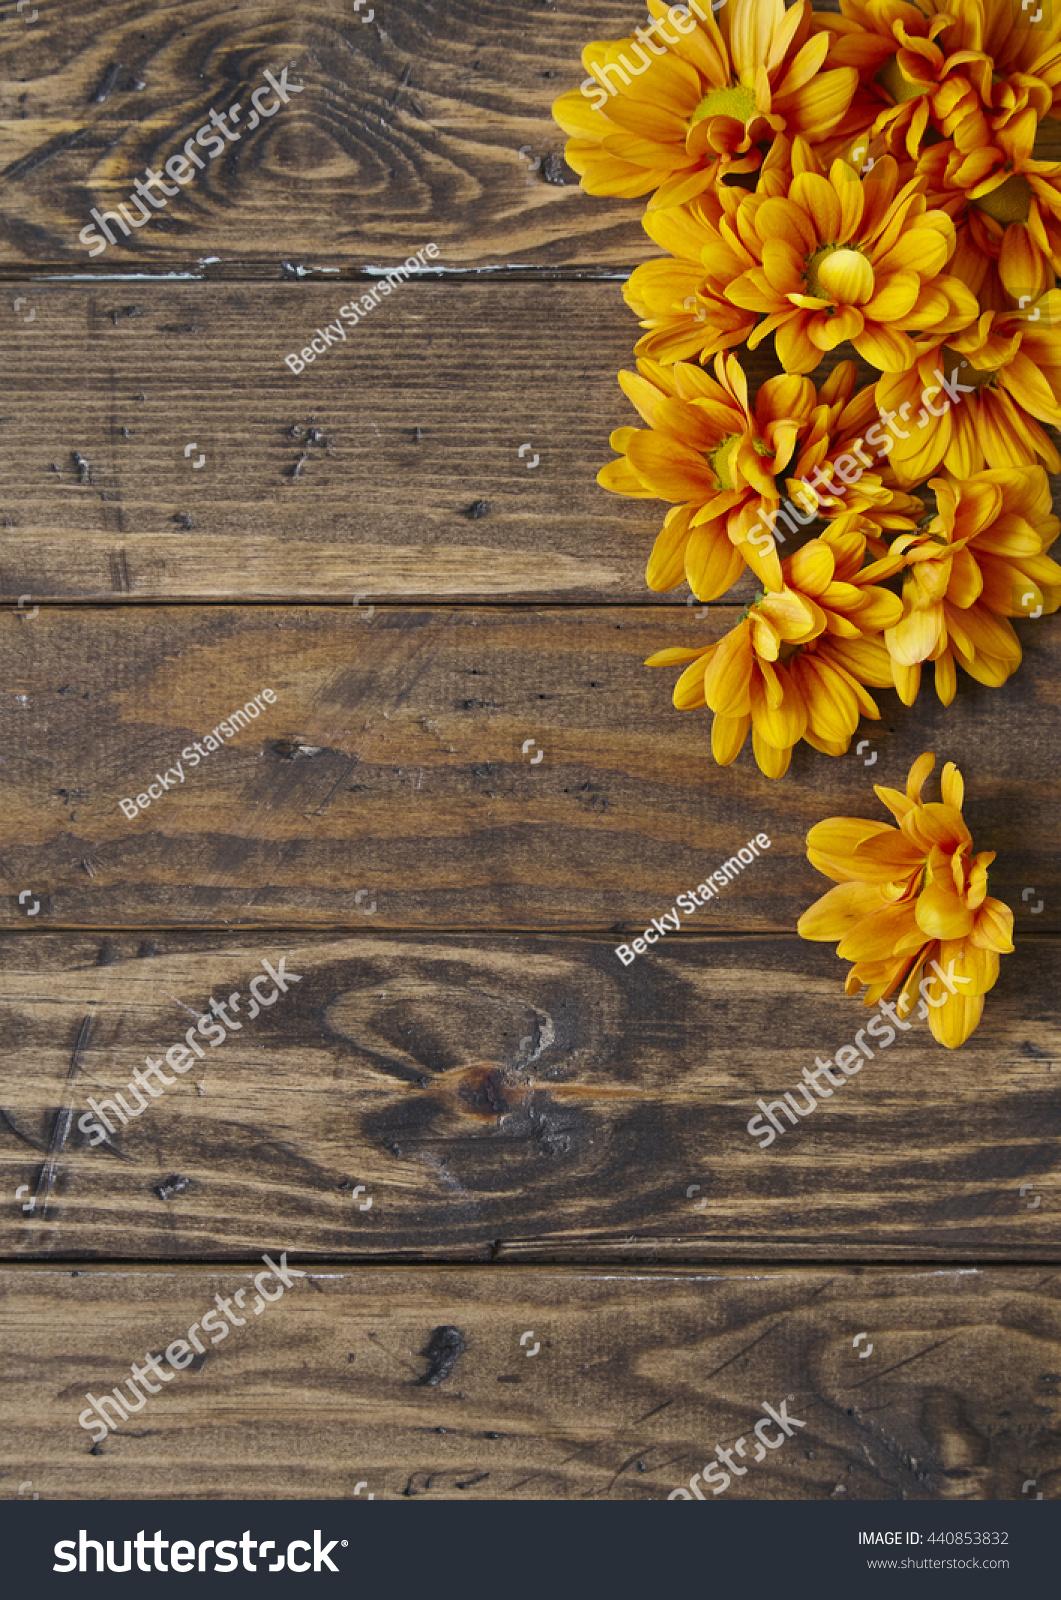 Royalty Free Floral Border